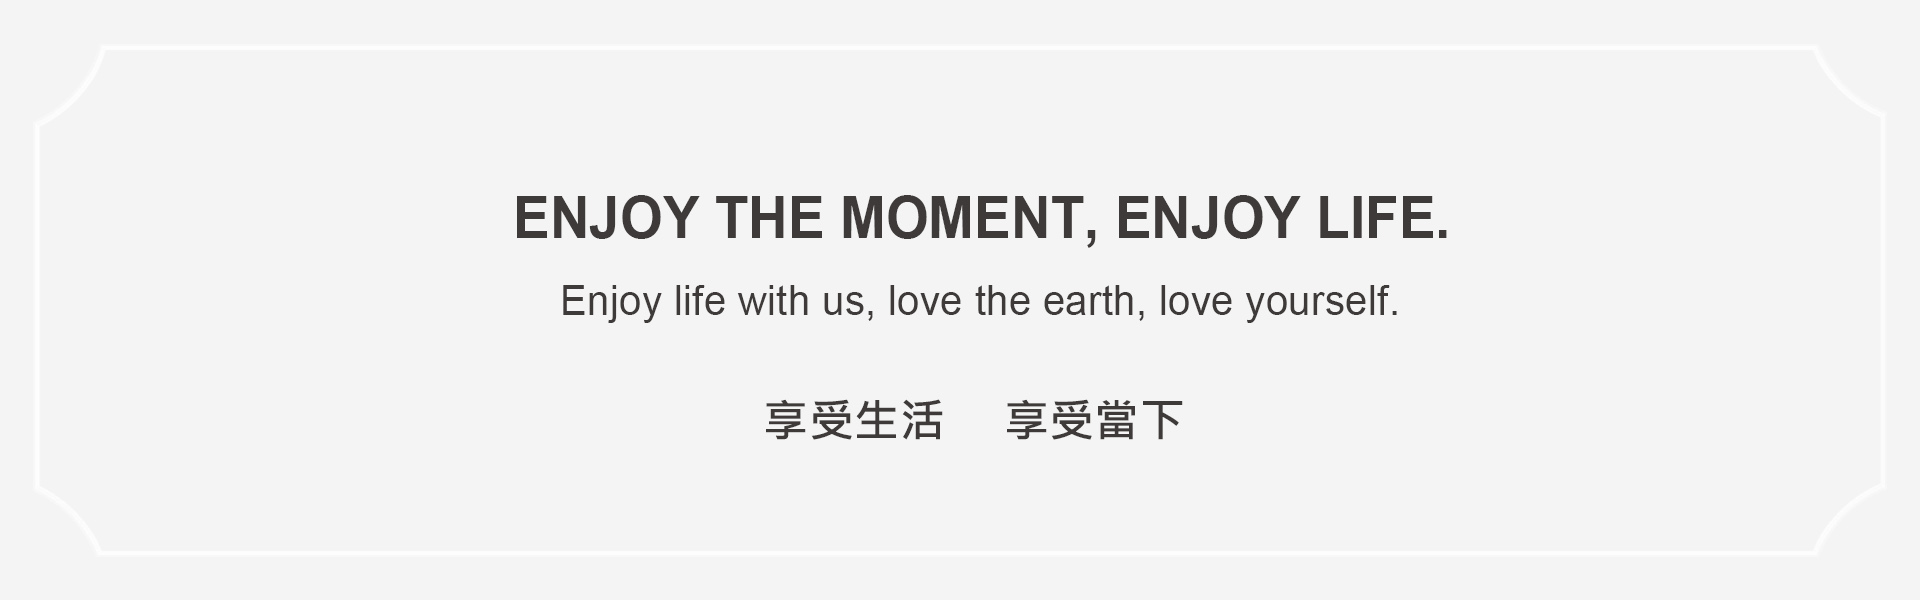 享受生活 享受當下 ENJOY THE MONENT ENJOY LIFE